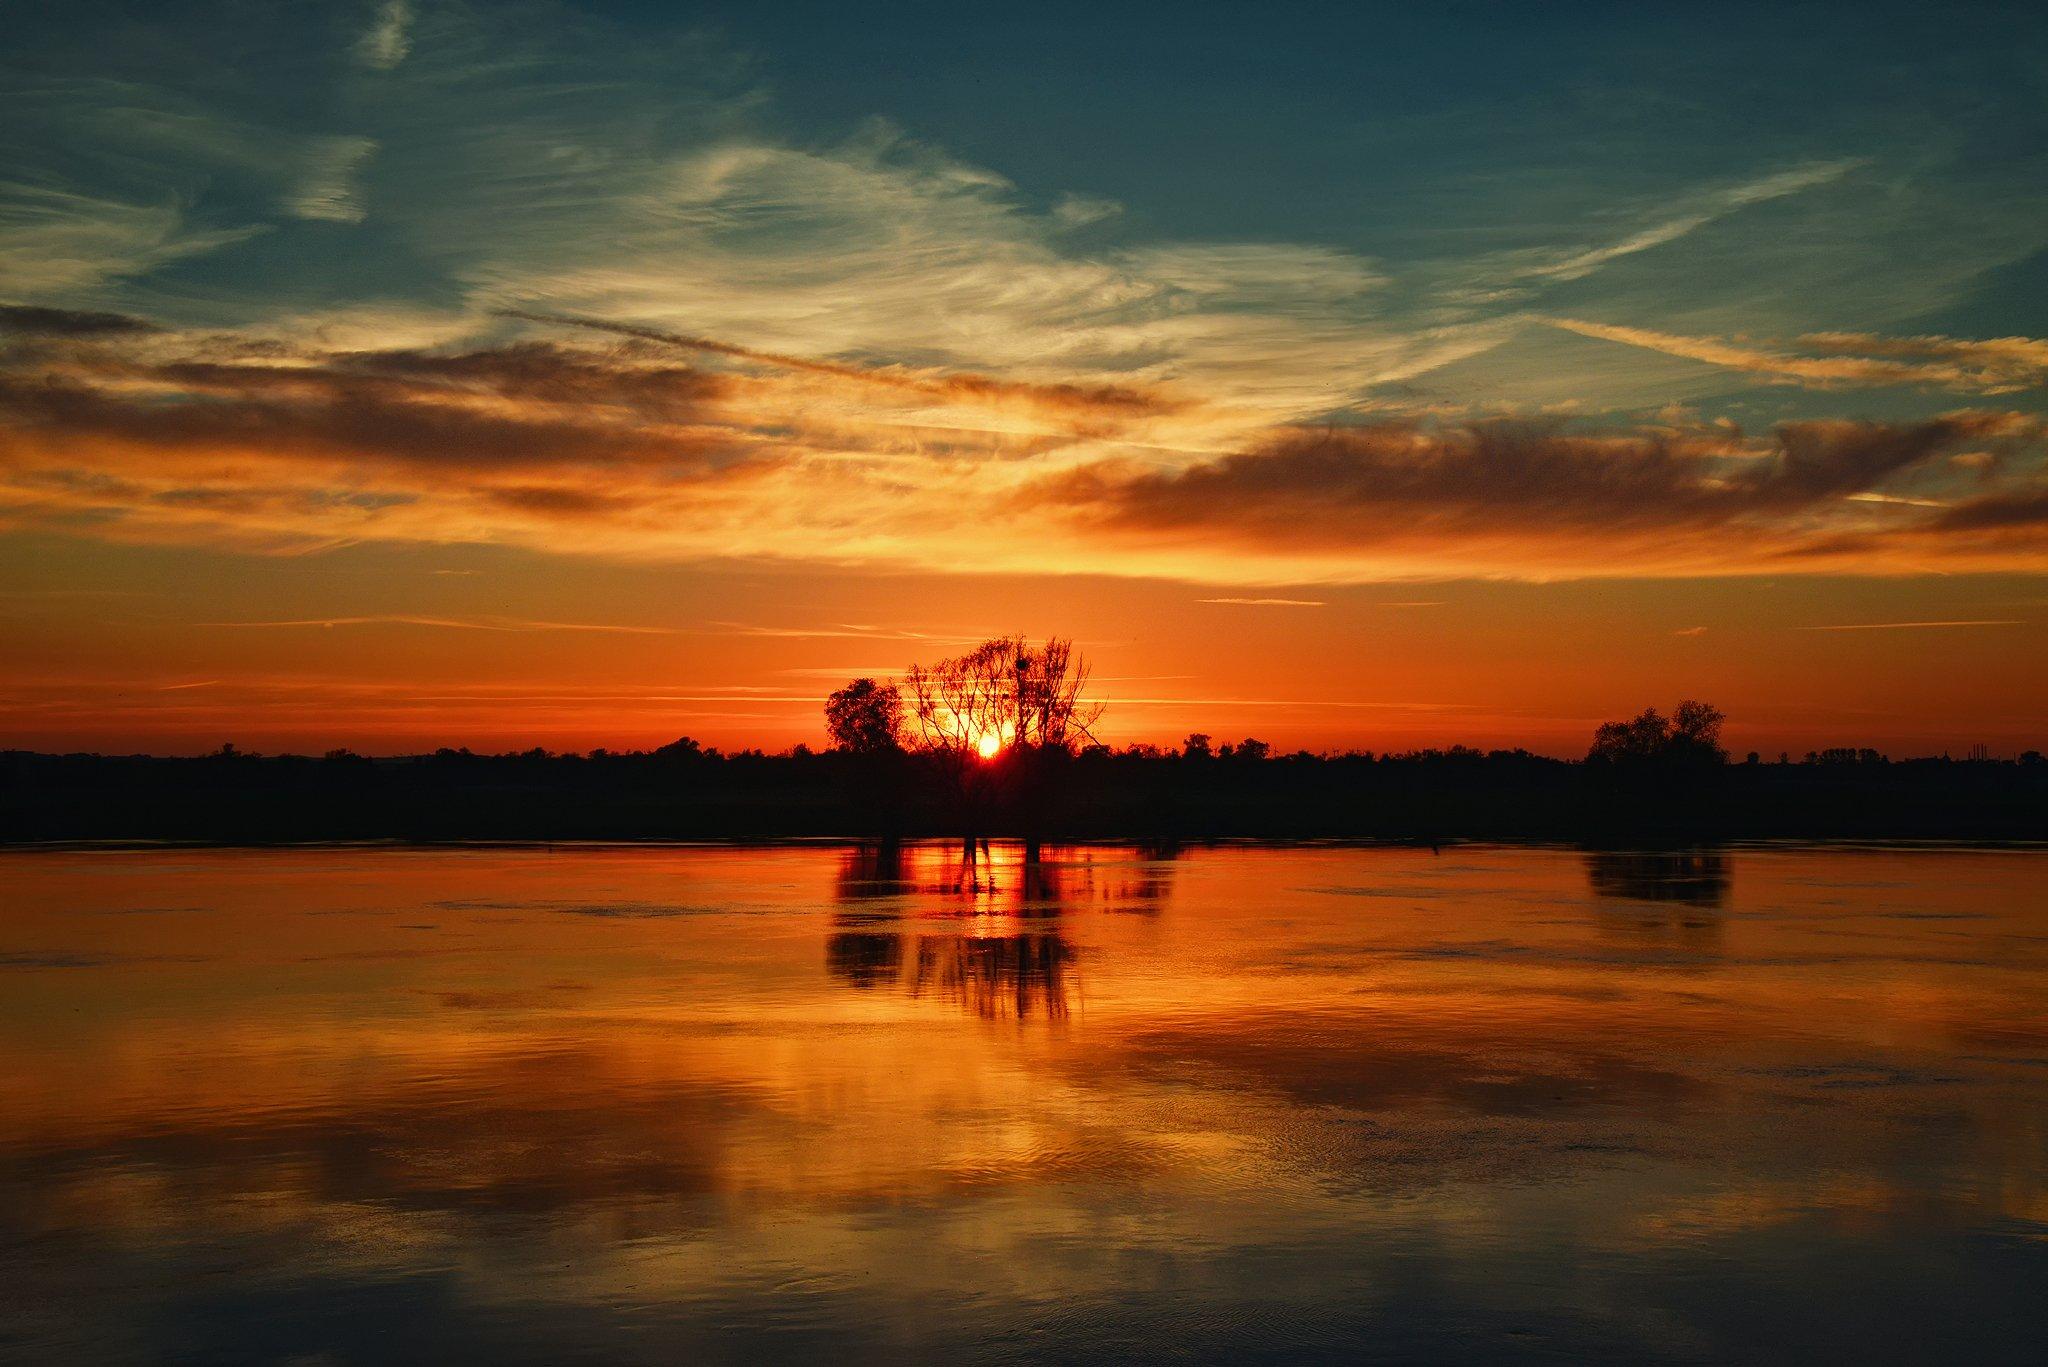 sunsed sundown odra river poland red sun water tree clouds magic, Radoslaw Dranikowski